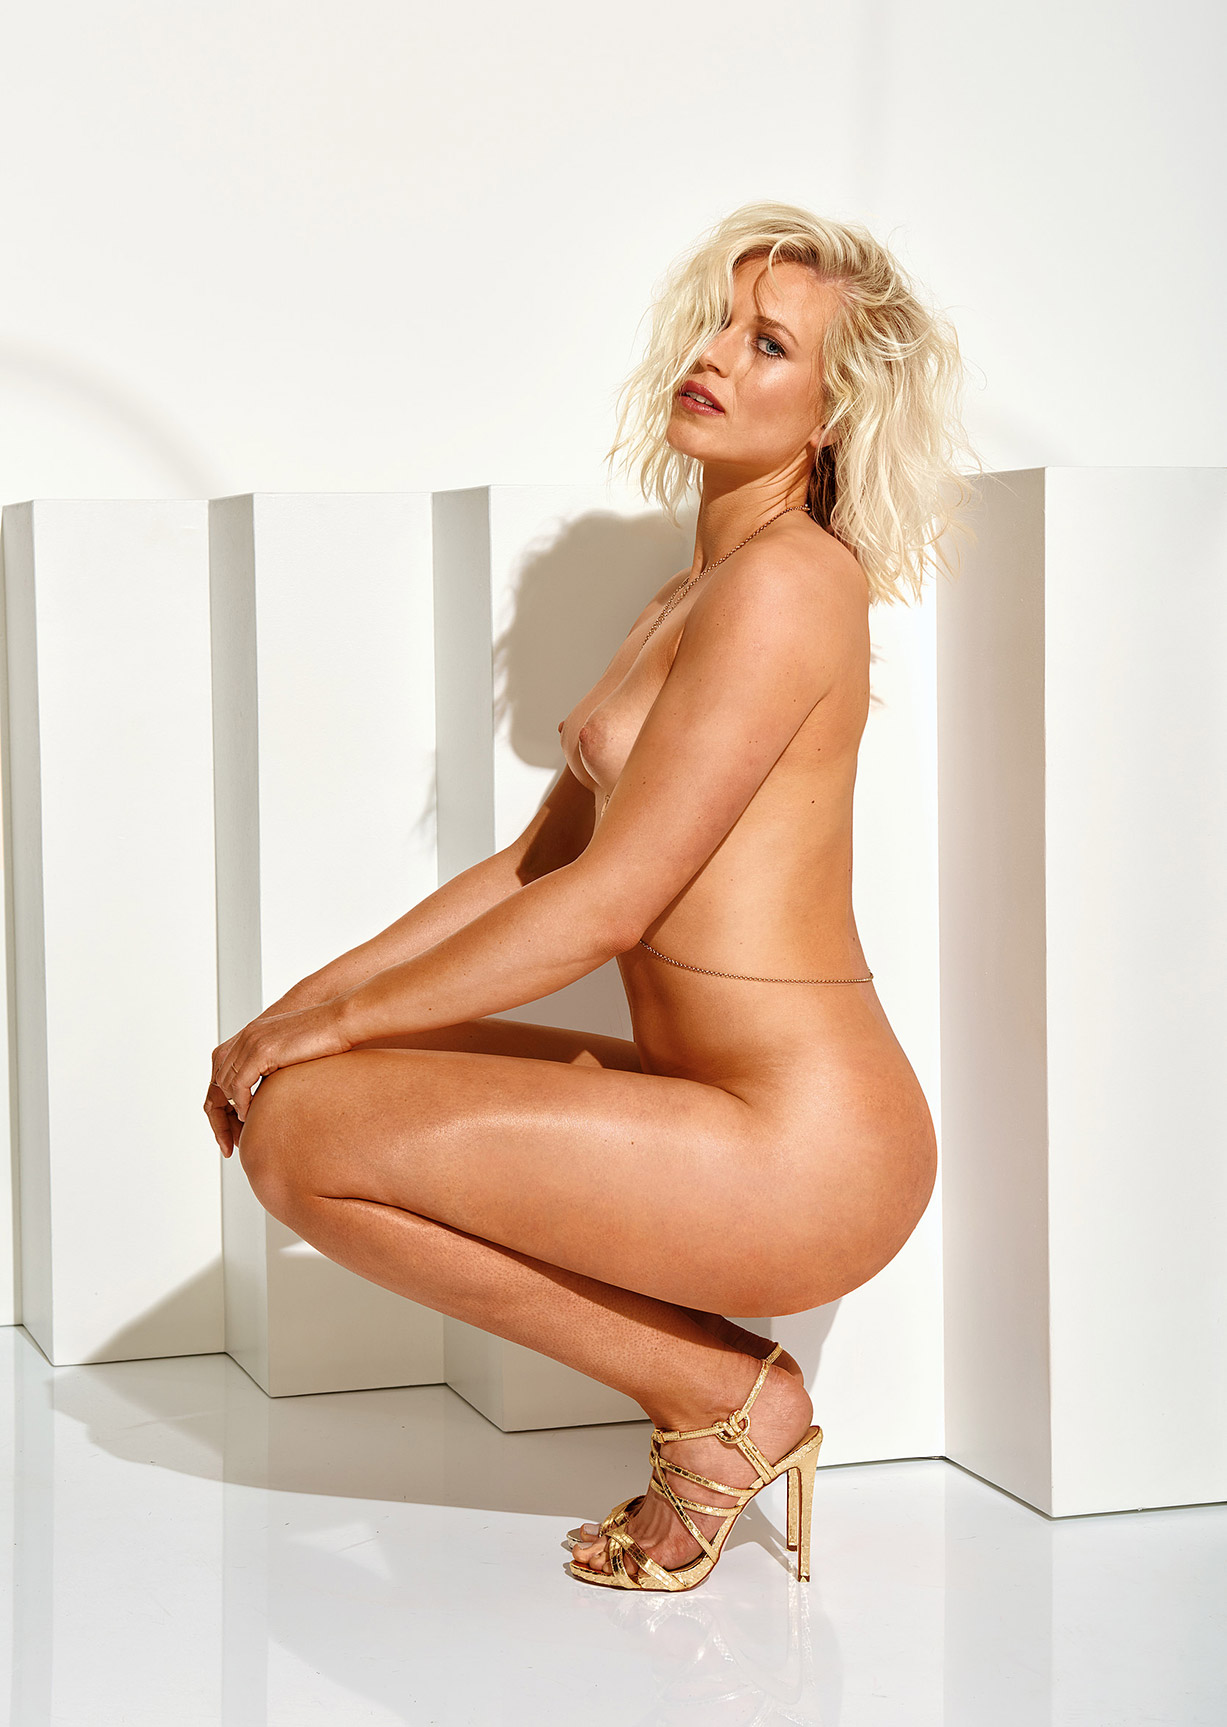 German-Nude-Olympic-Stars-for-Playboy-7.jpg